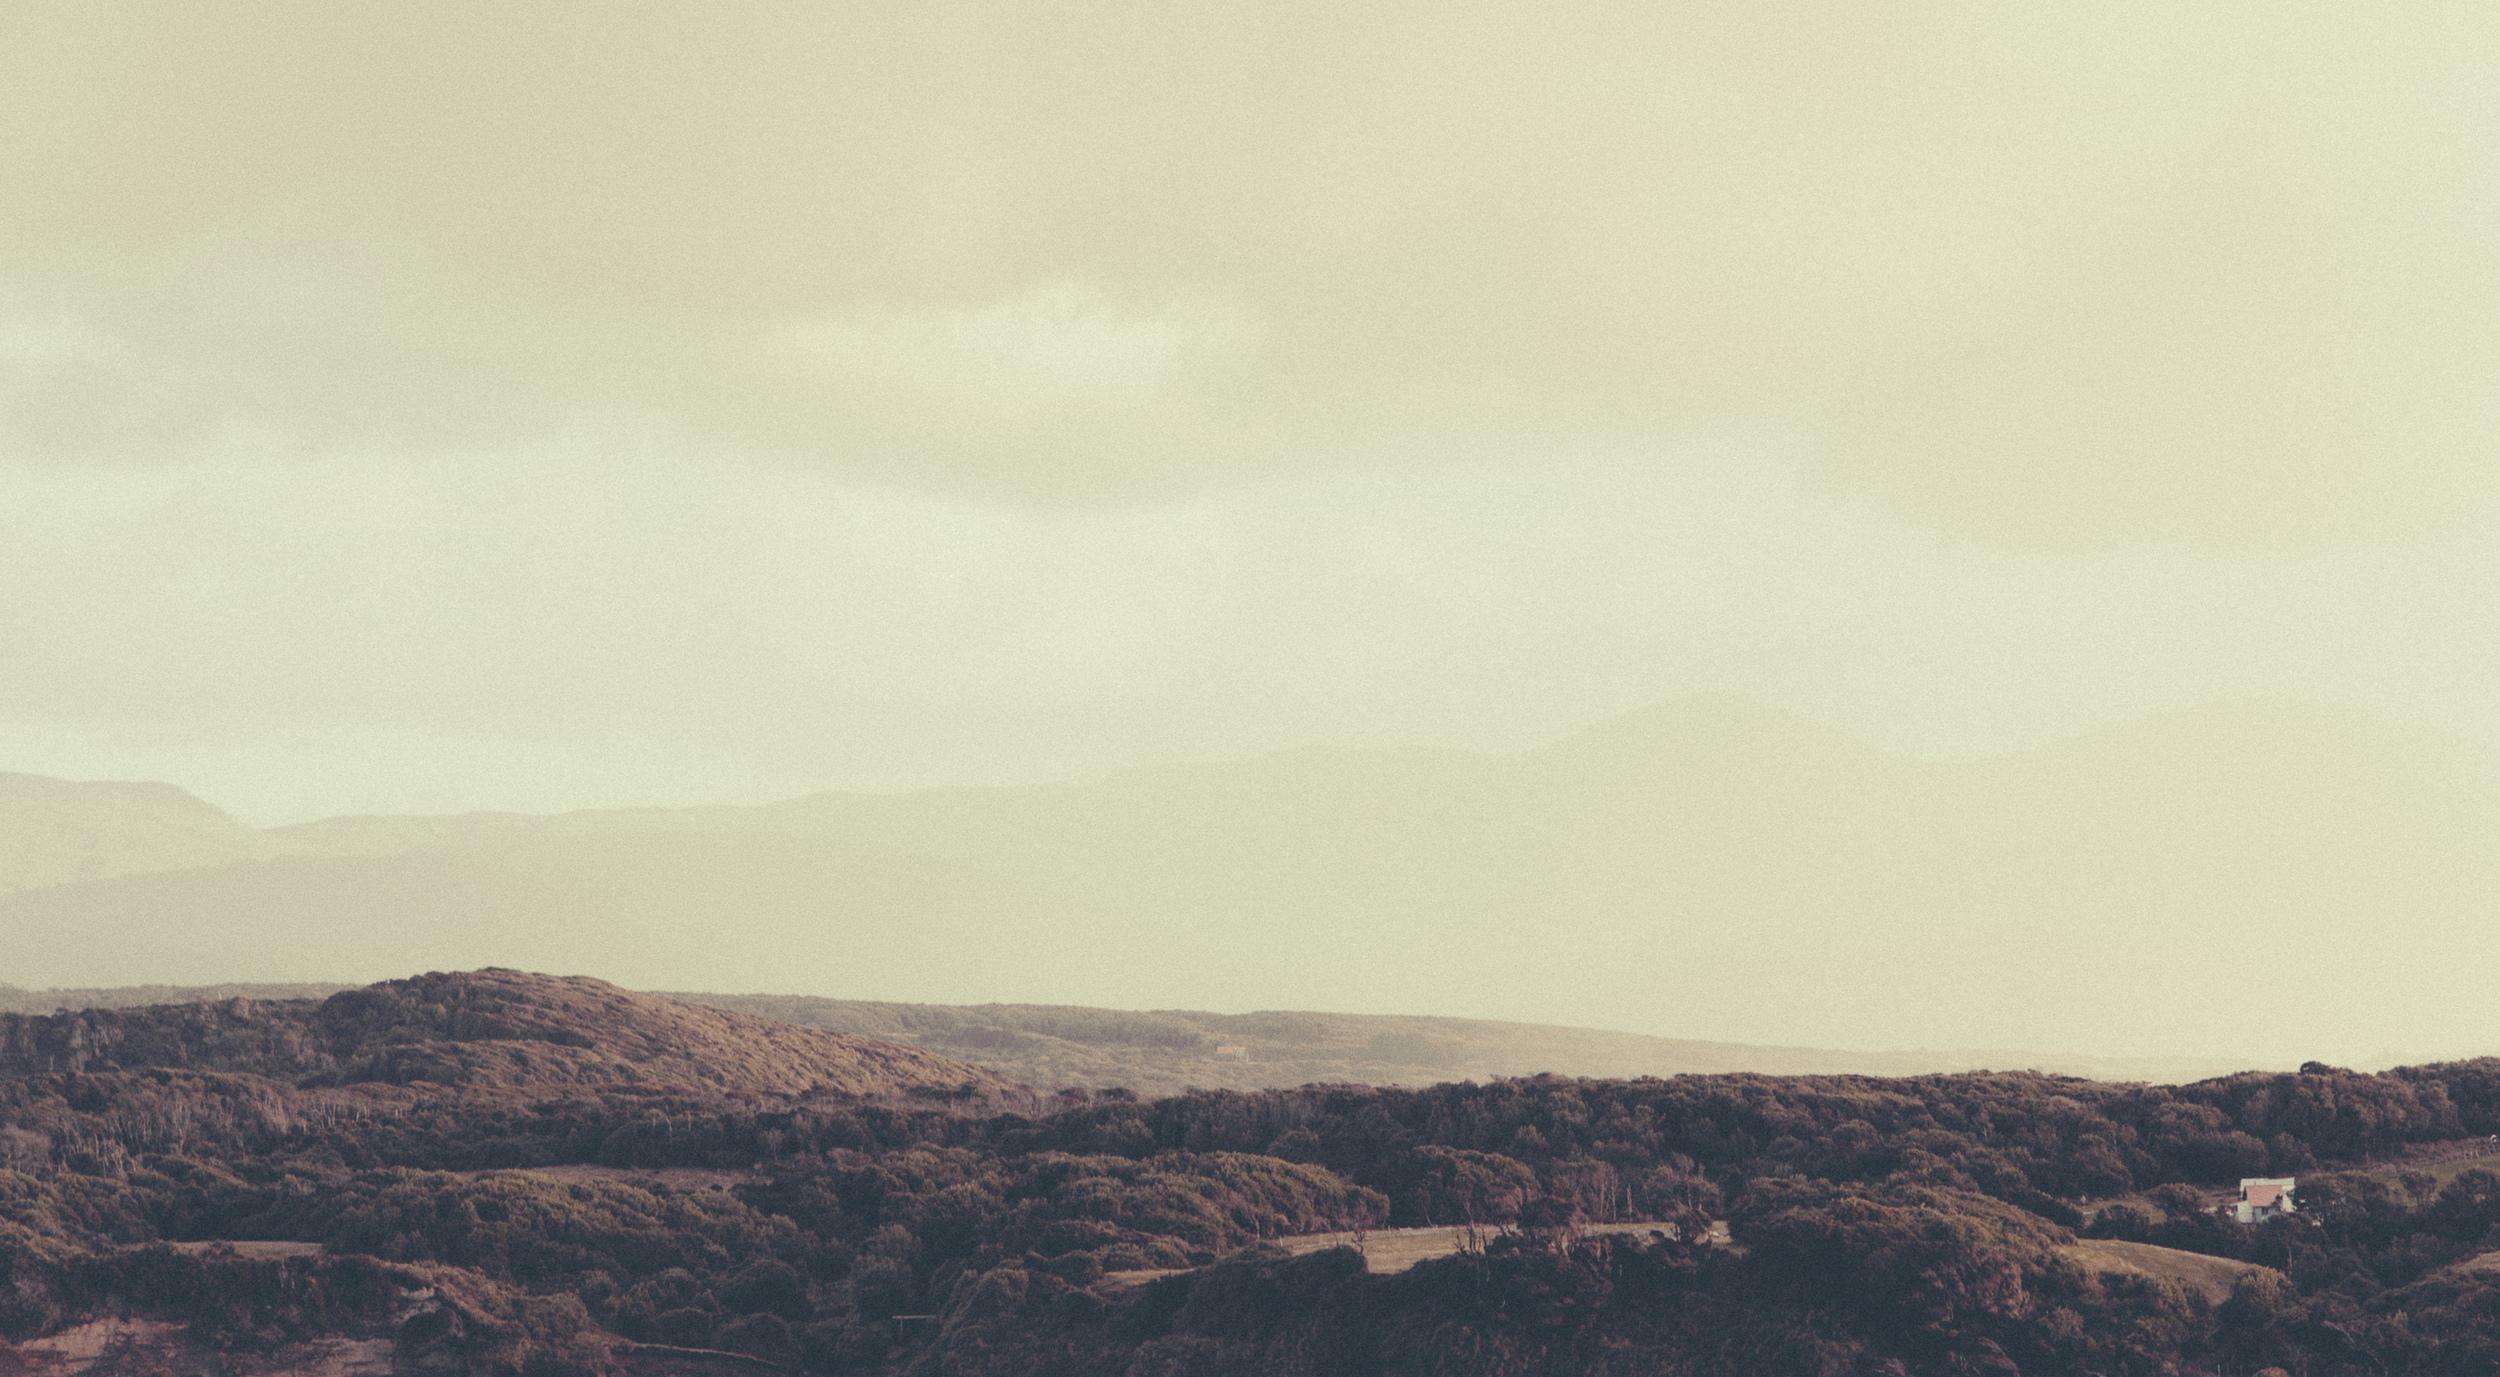 Winter on Chiloe brings regular rain.